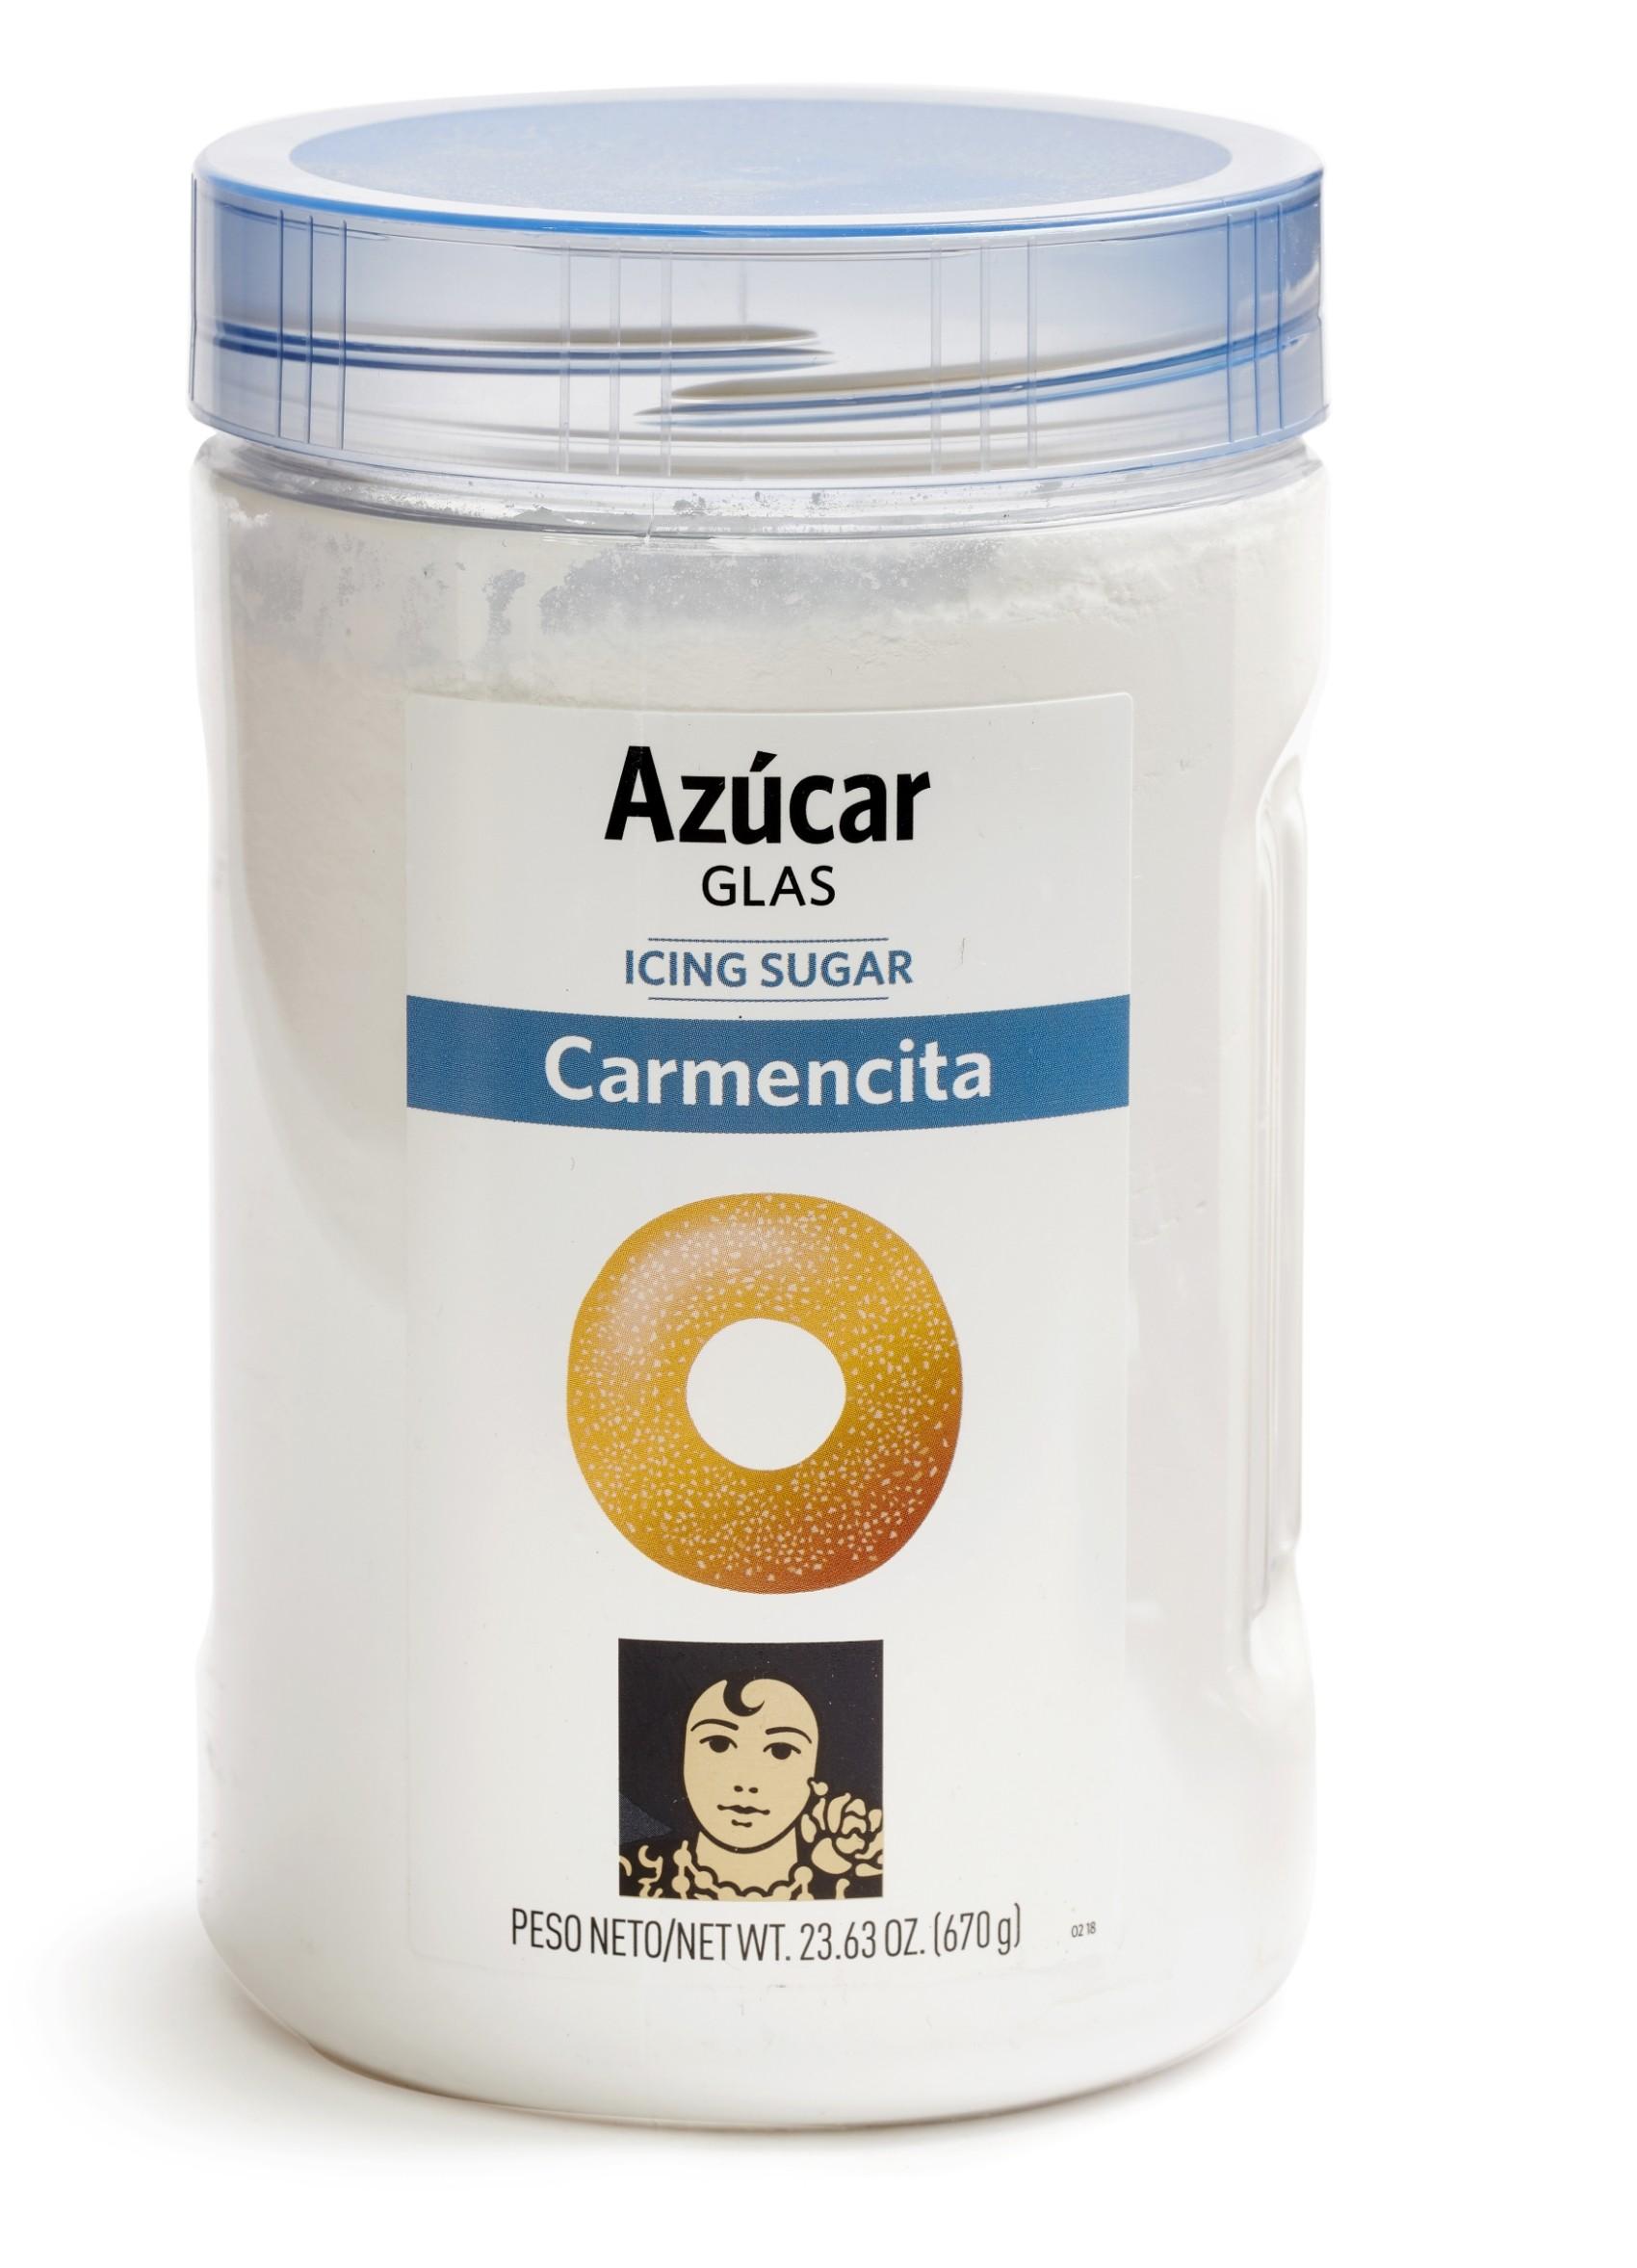 Azucar3@2x